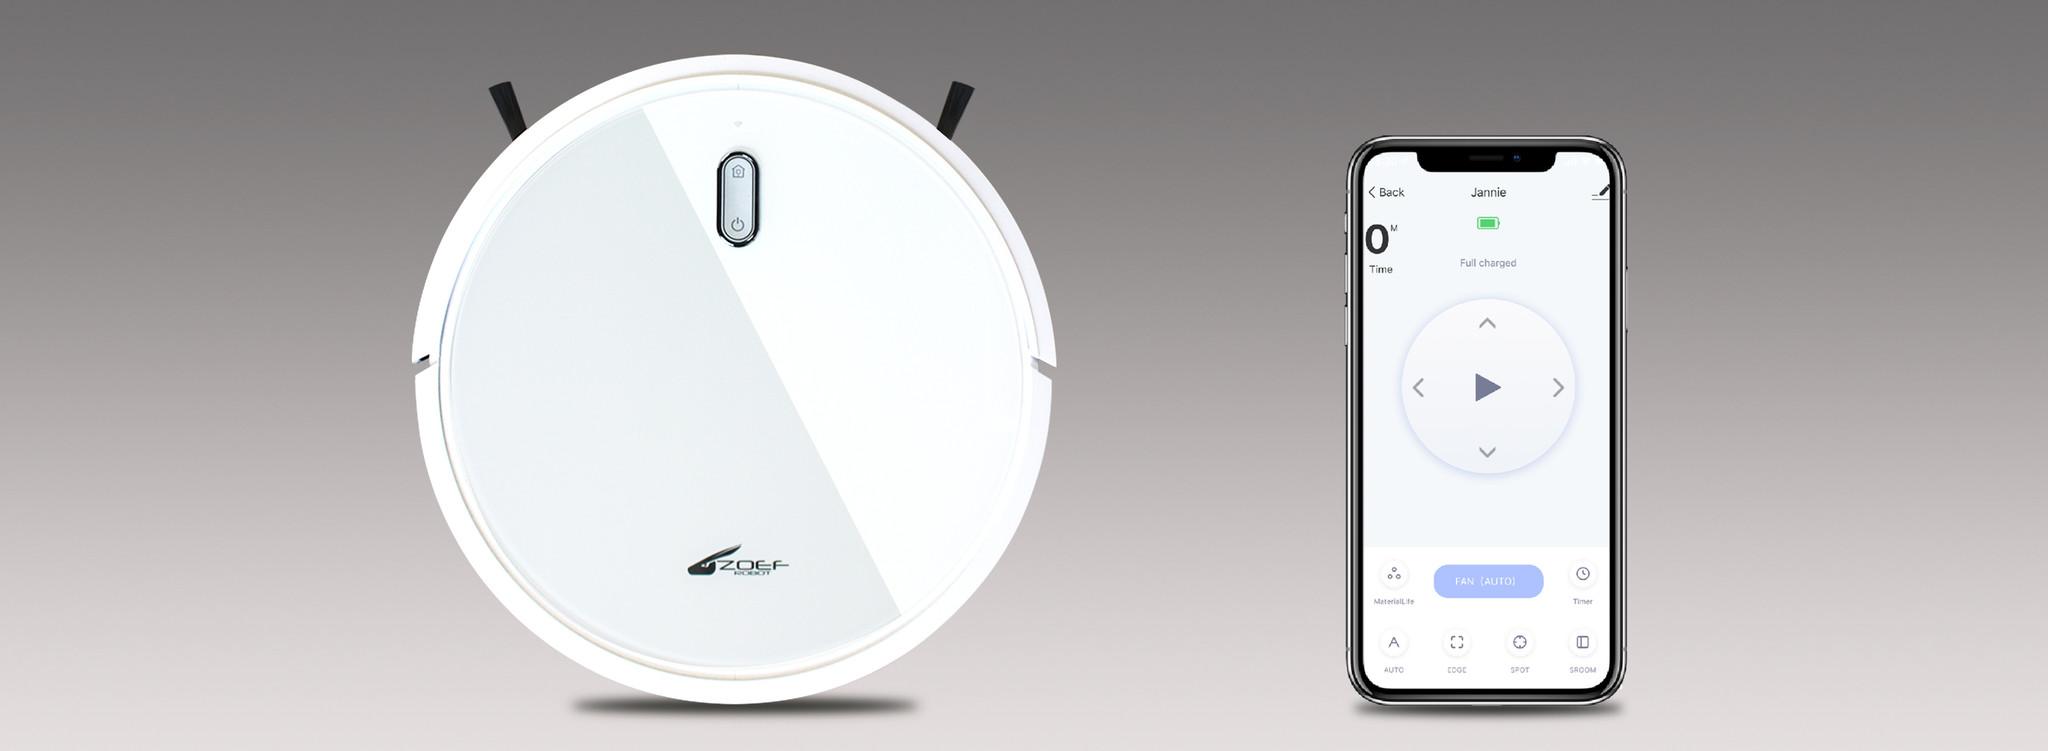 app-robotstofzuiger-jannie